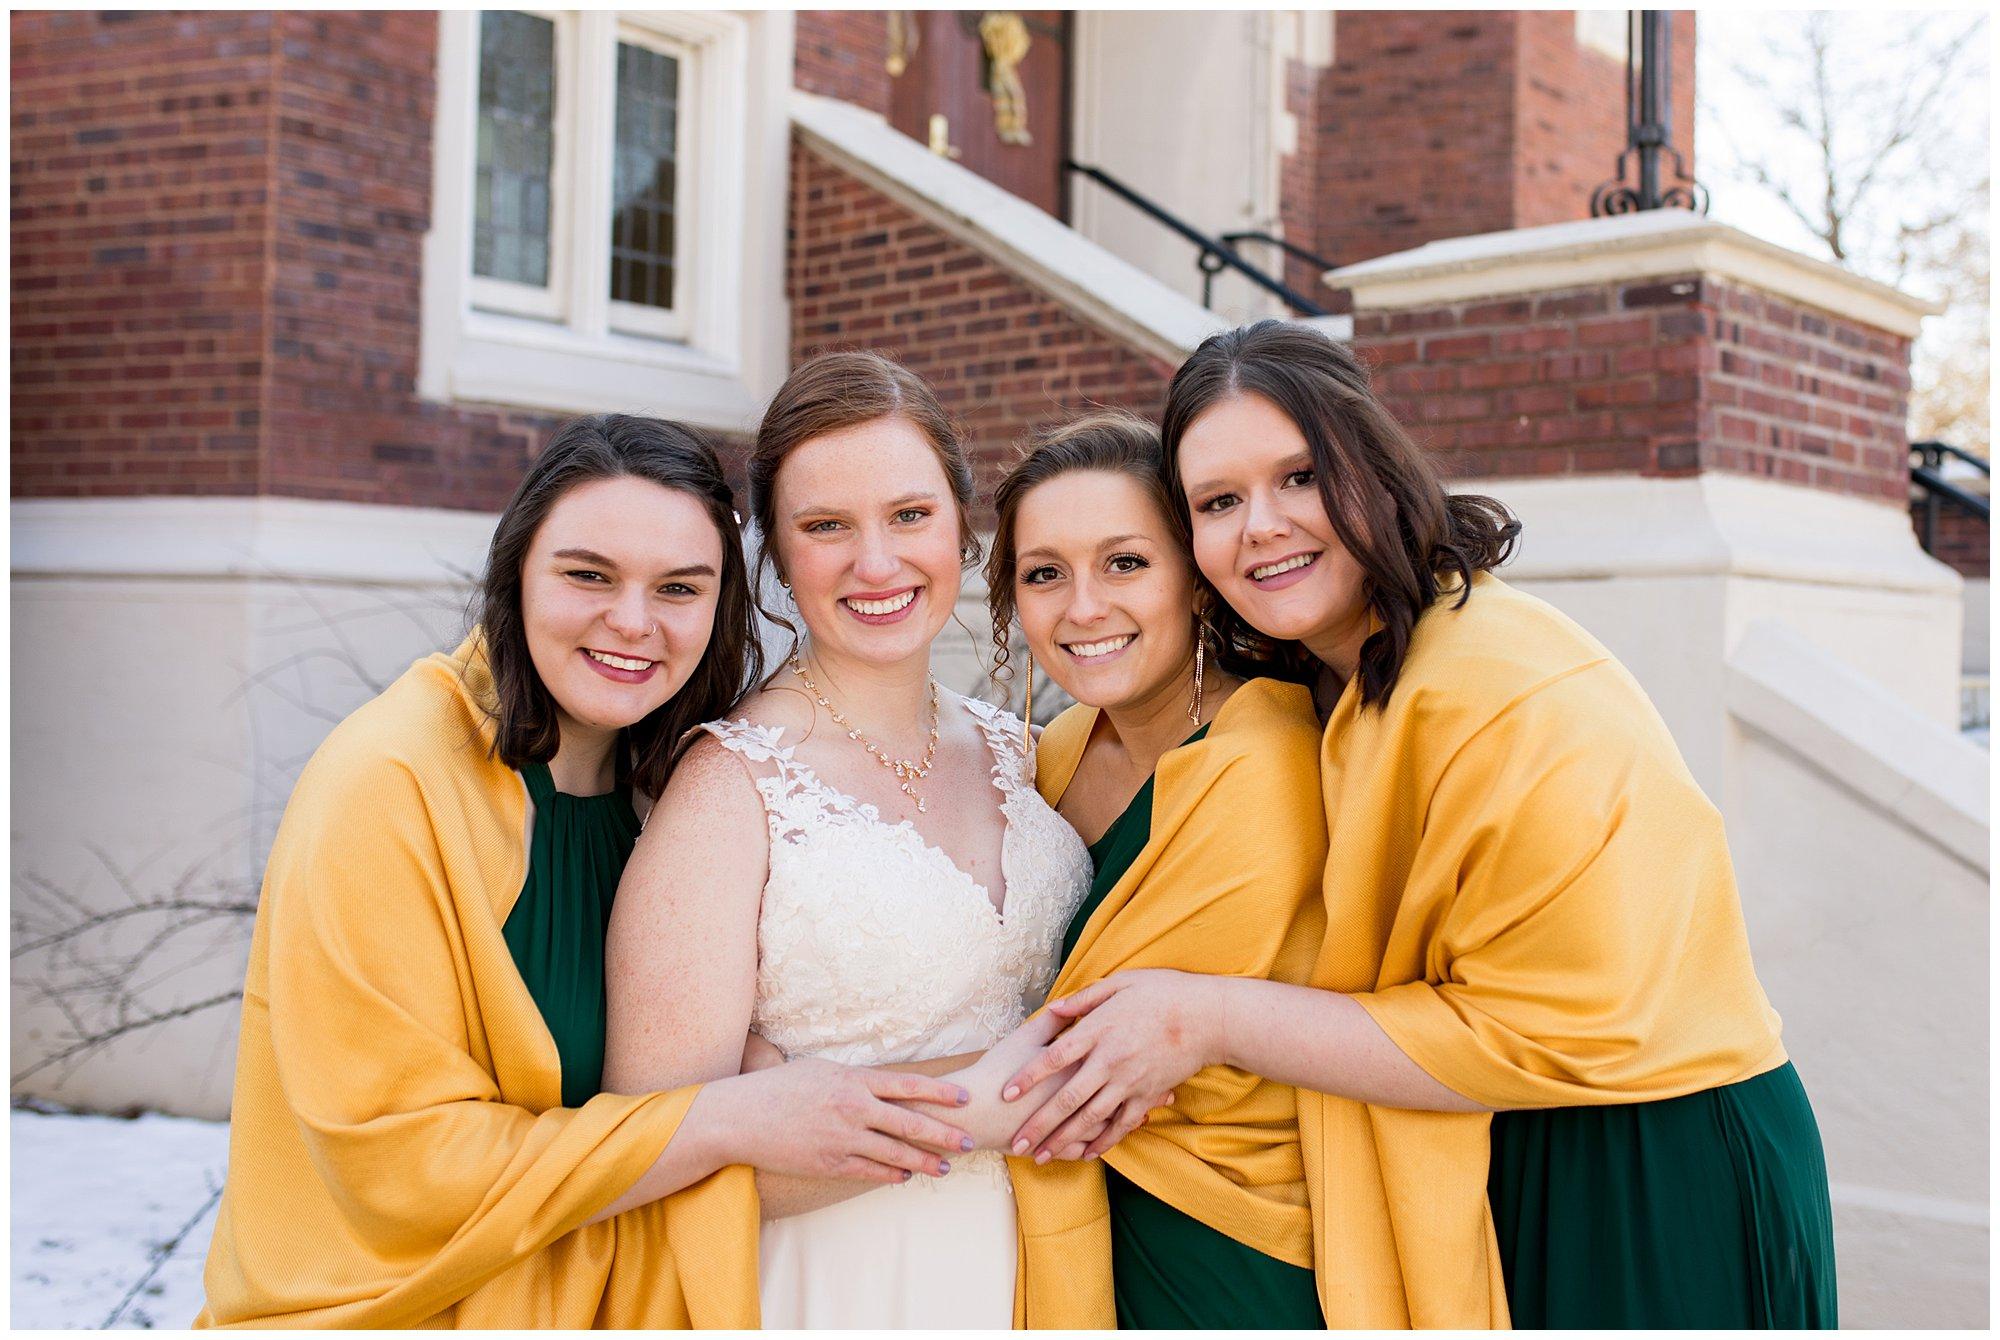 bride and bridesmaids snuggle close during wedding party photos